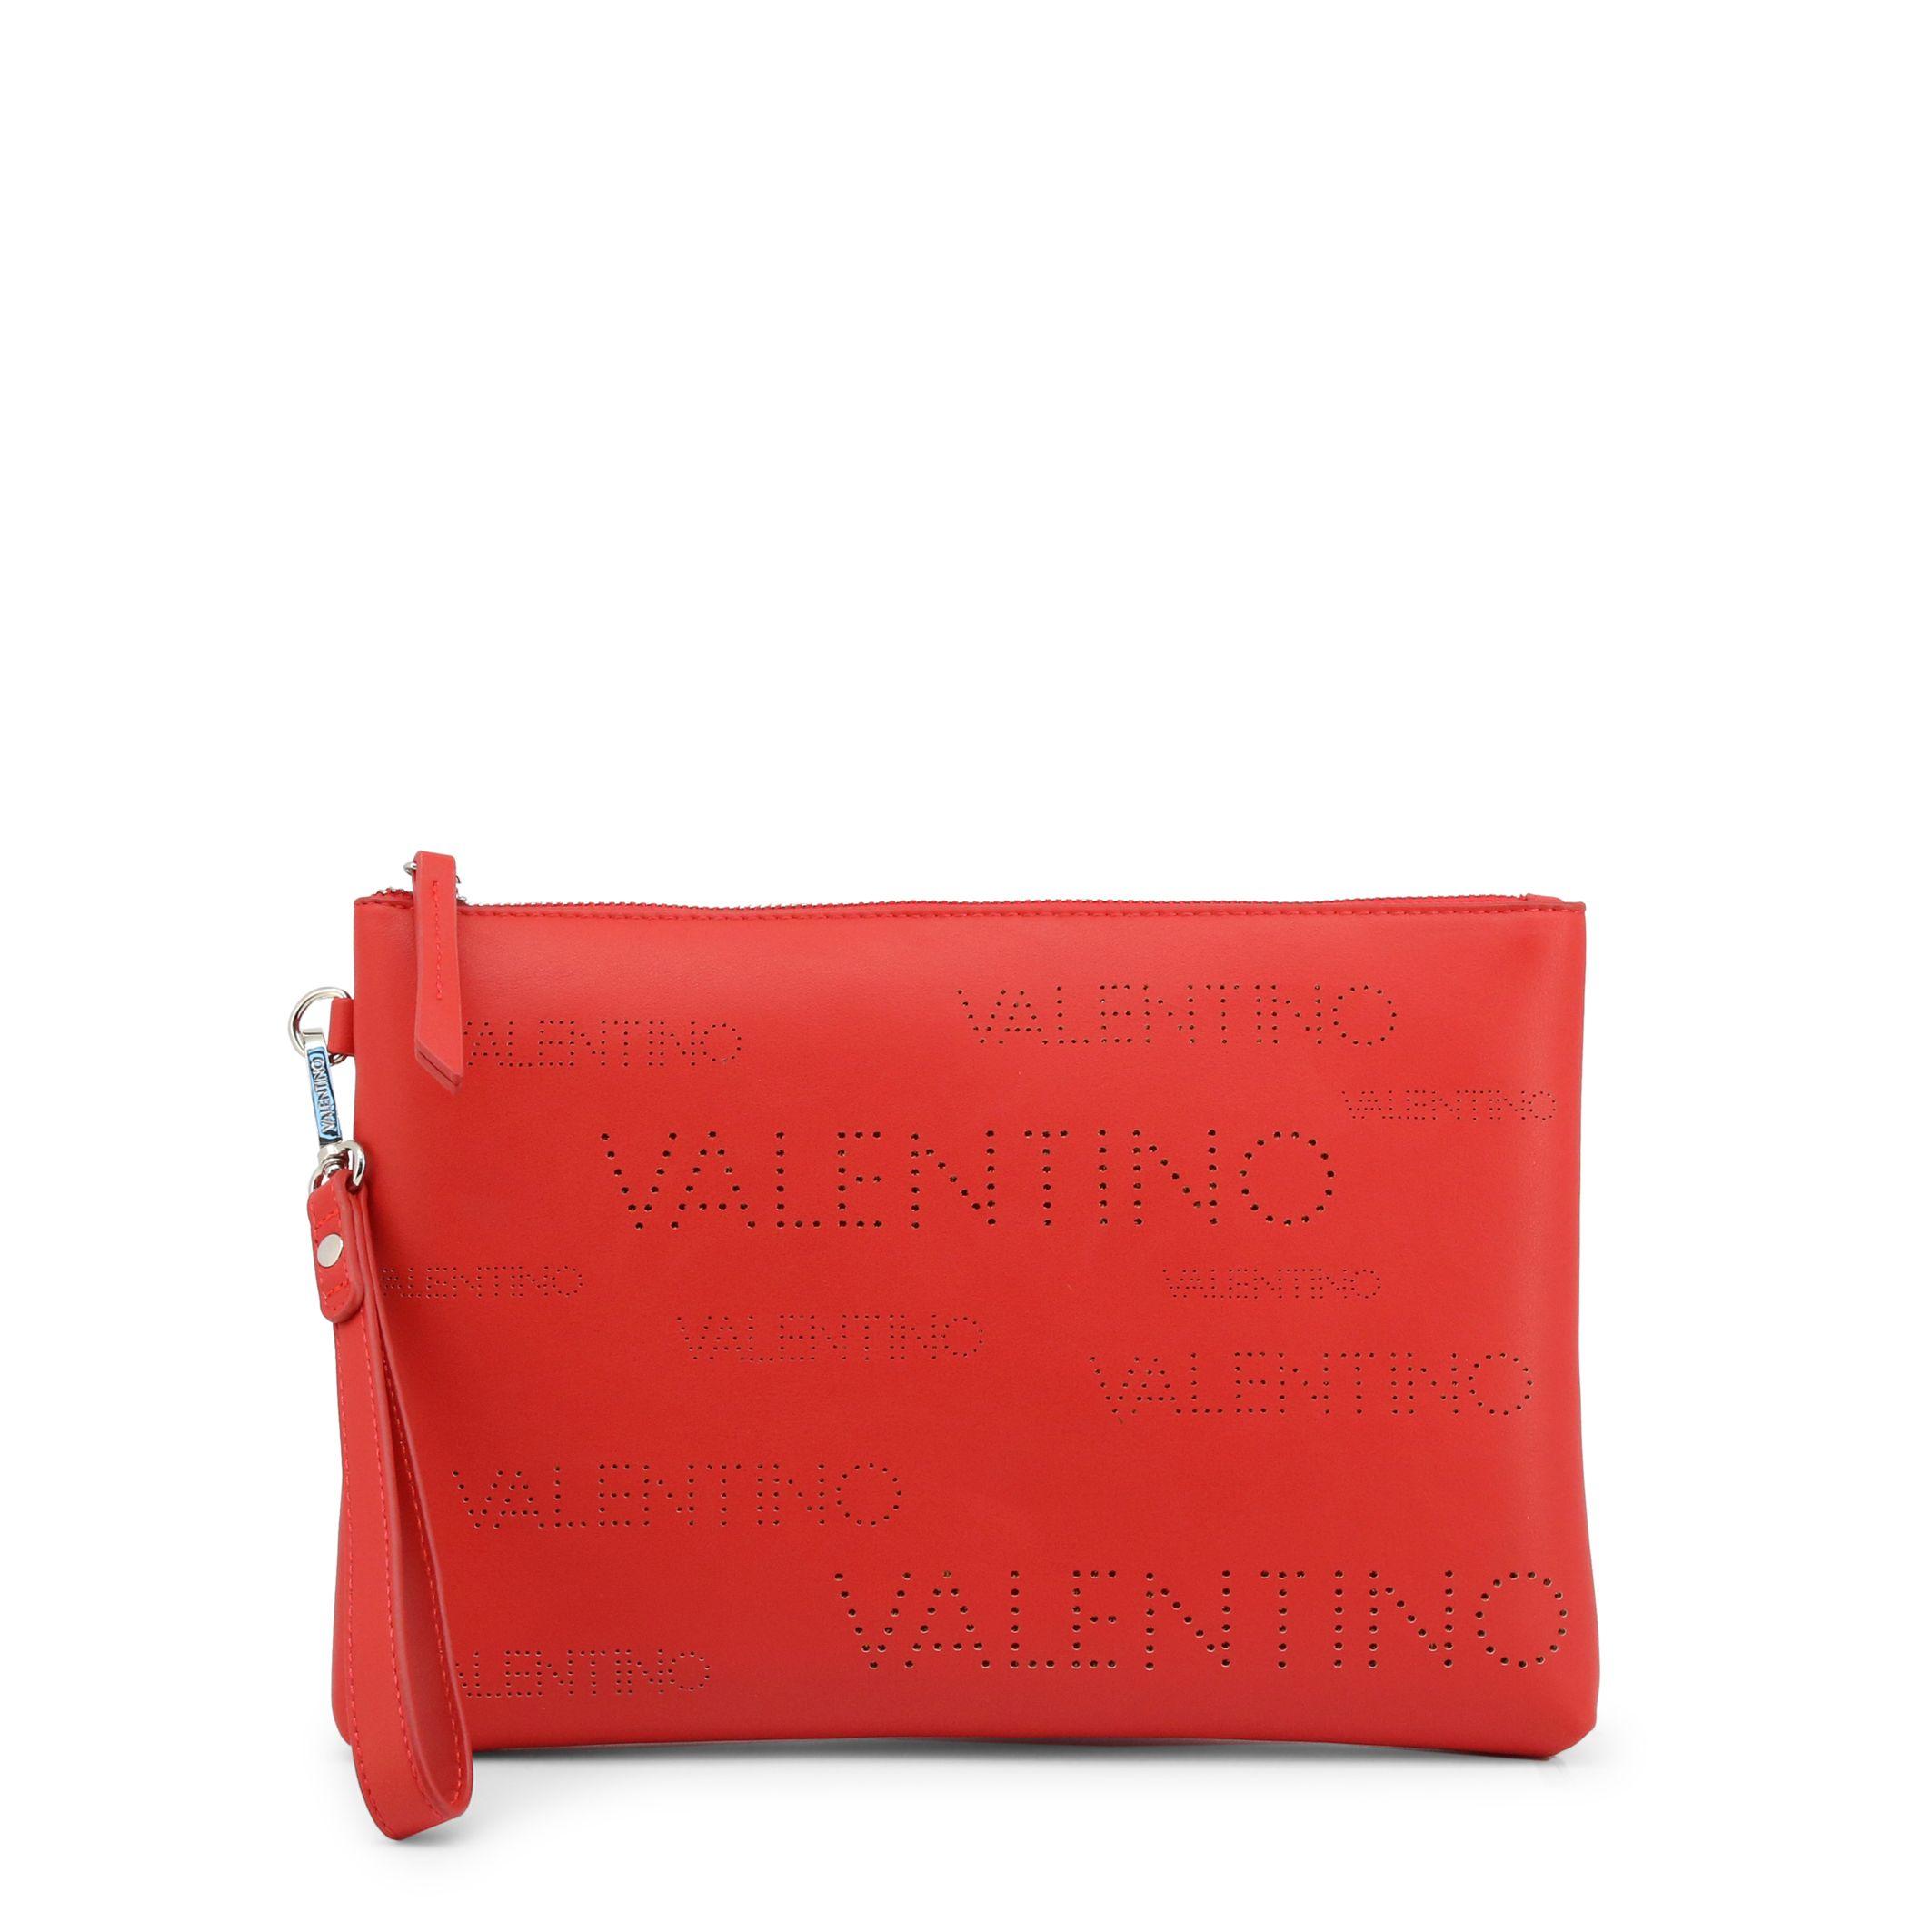 Valentino by Mario Valentino – VBS42A02